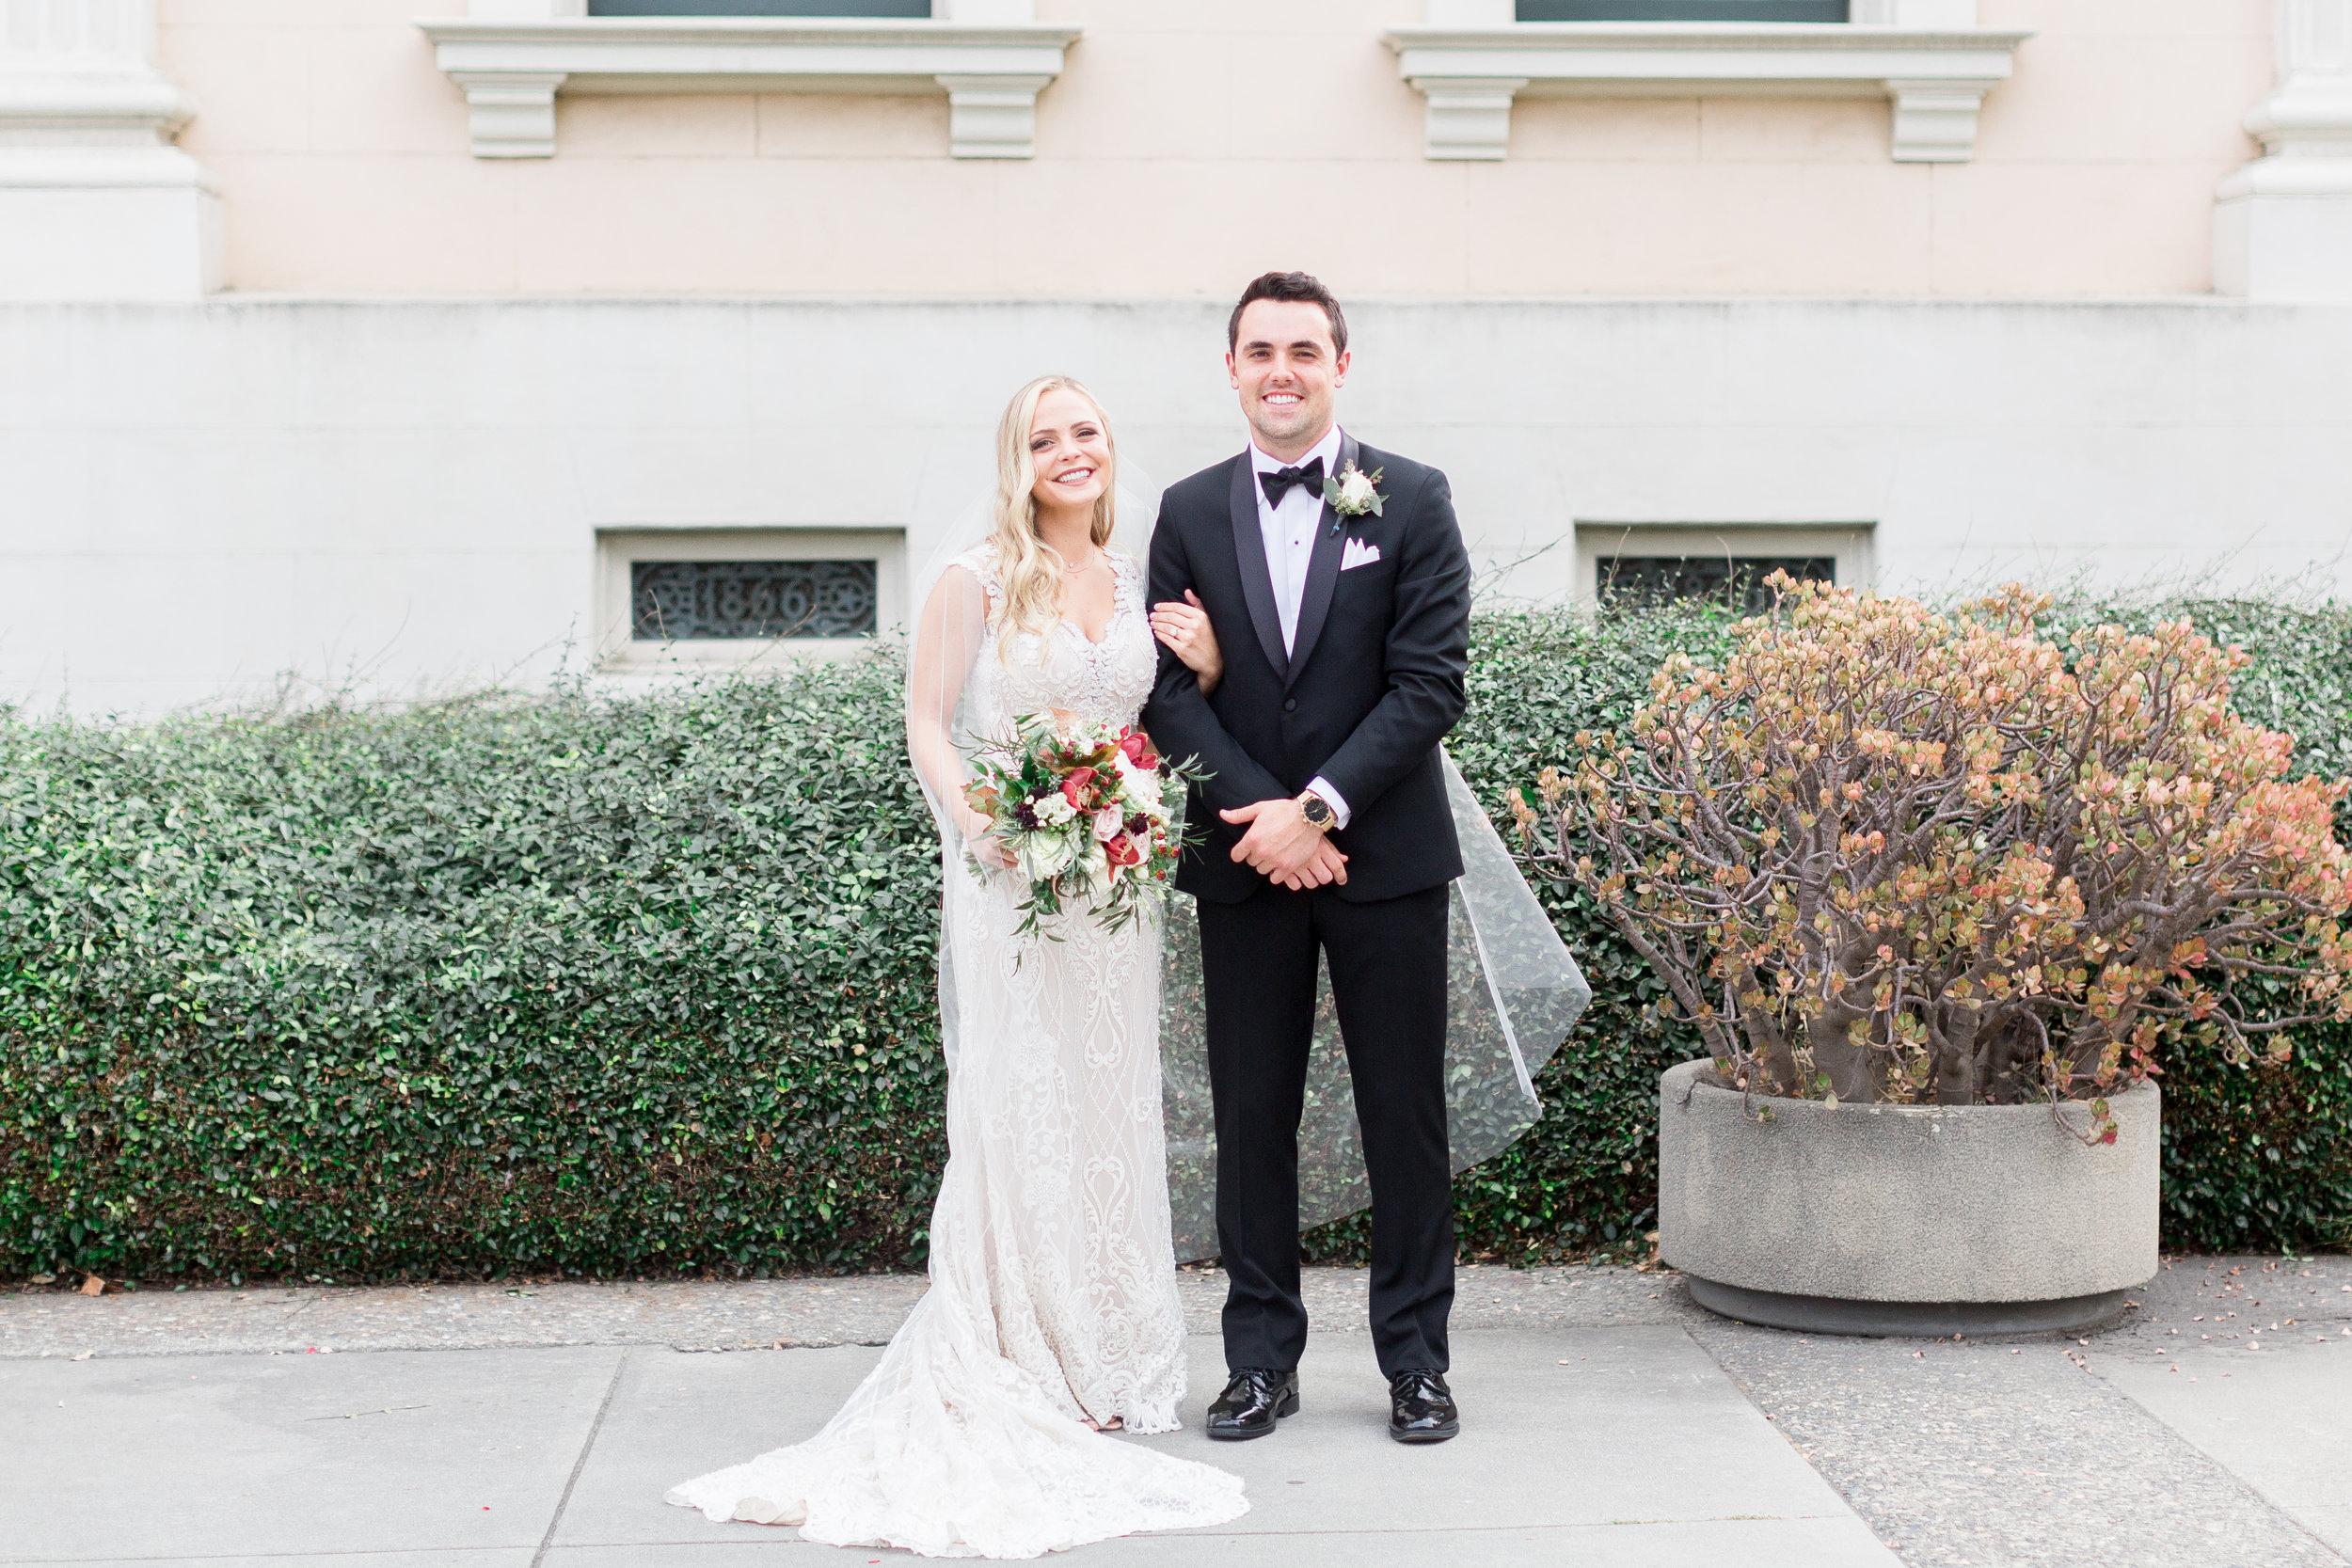 Downtown-San-Jose-wedding-photographer (43 of 335).jpg